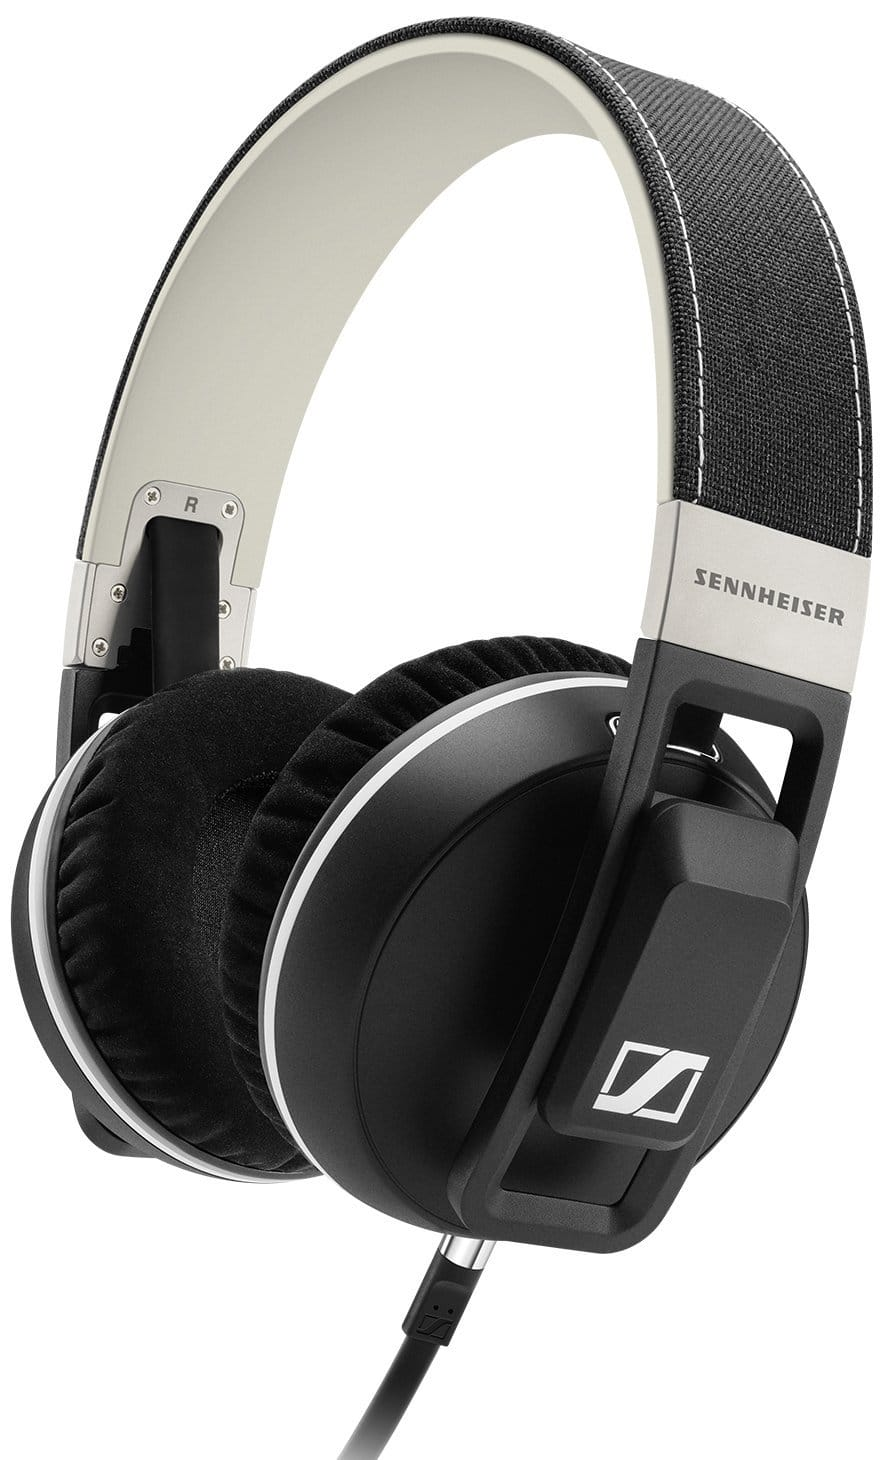 Sennheiser Urbanite XL Galaxy Over-Ear Headphones - Black $69.95 FS@amazon